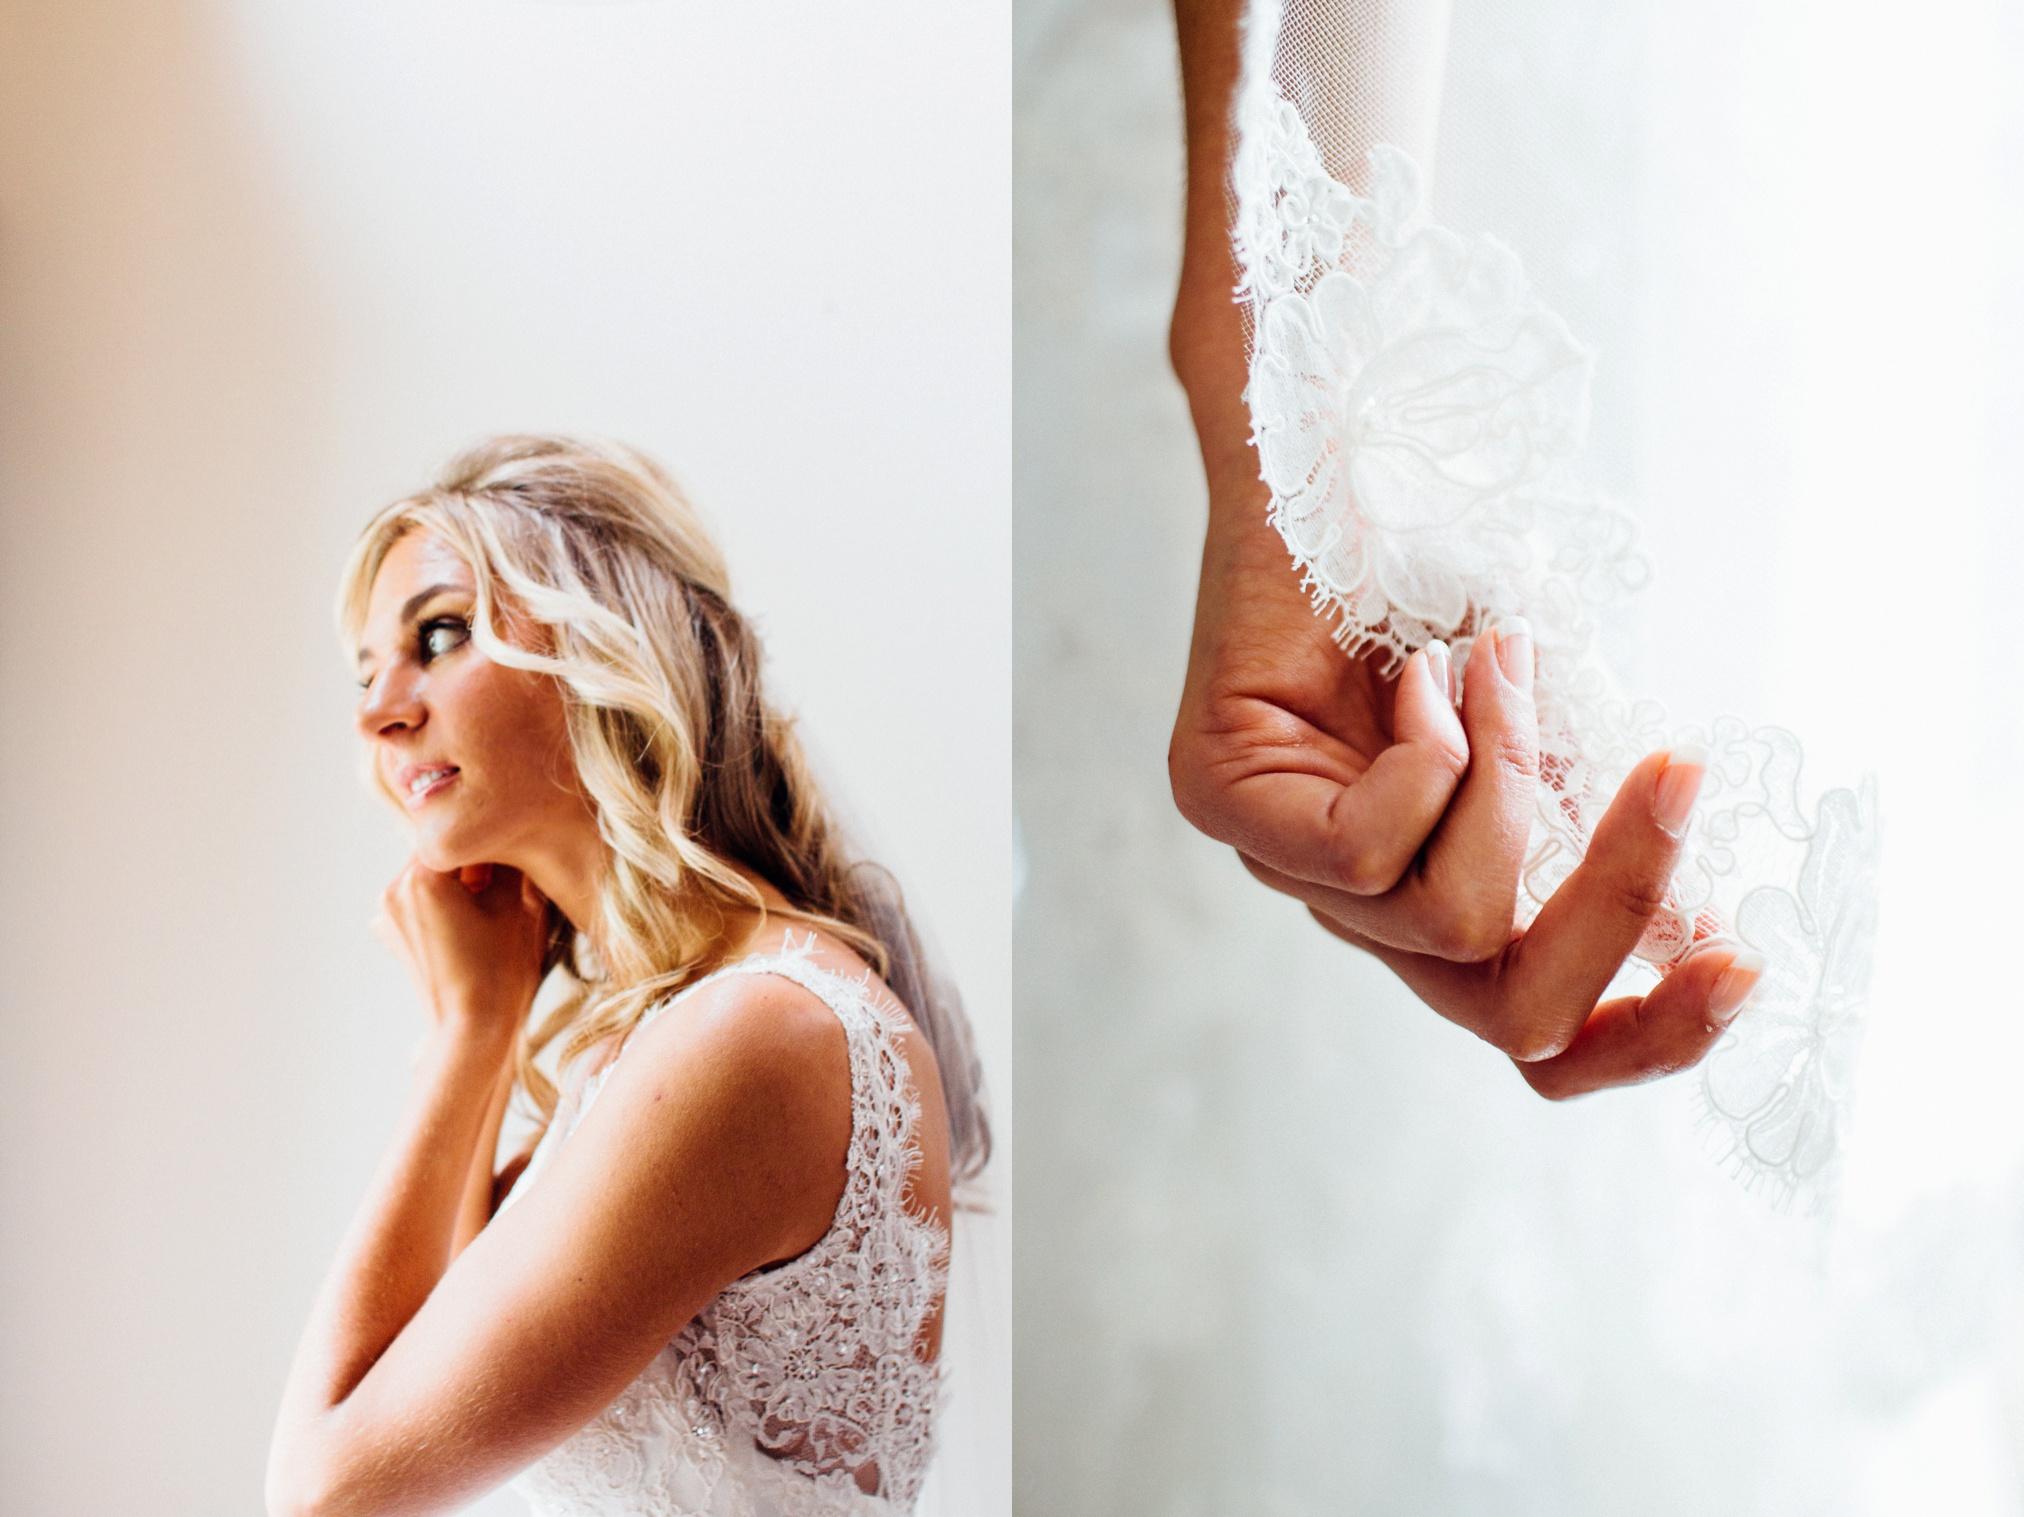 schmid_wedding-74.jpg